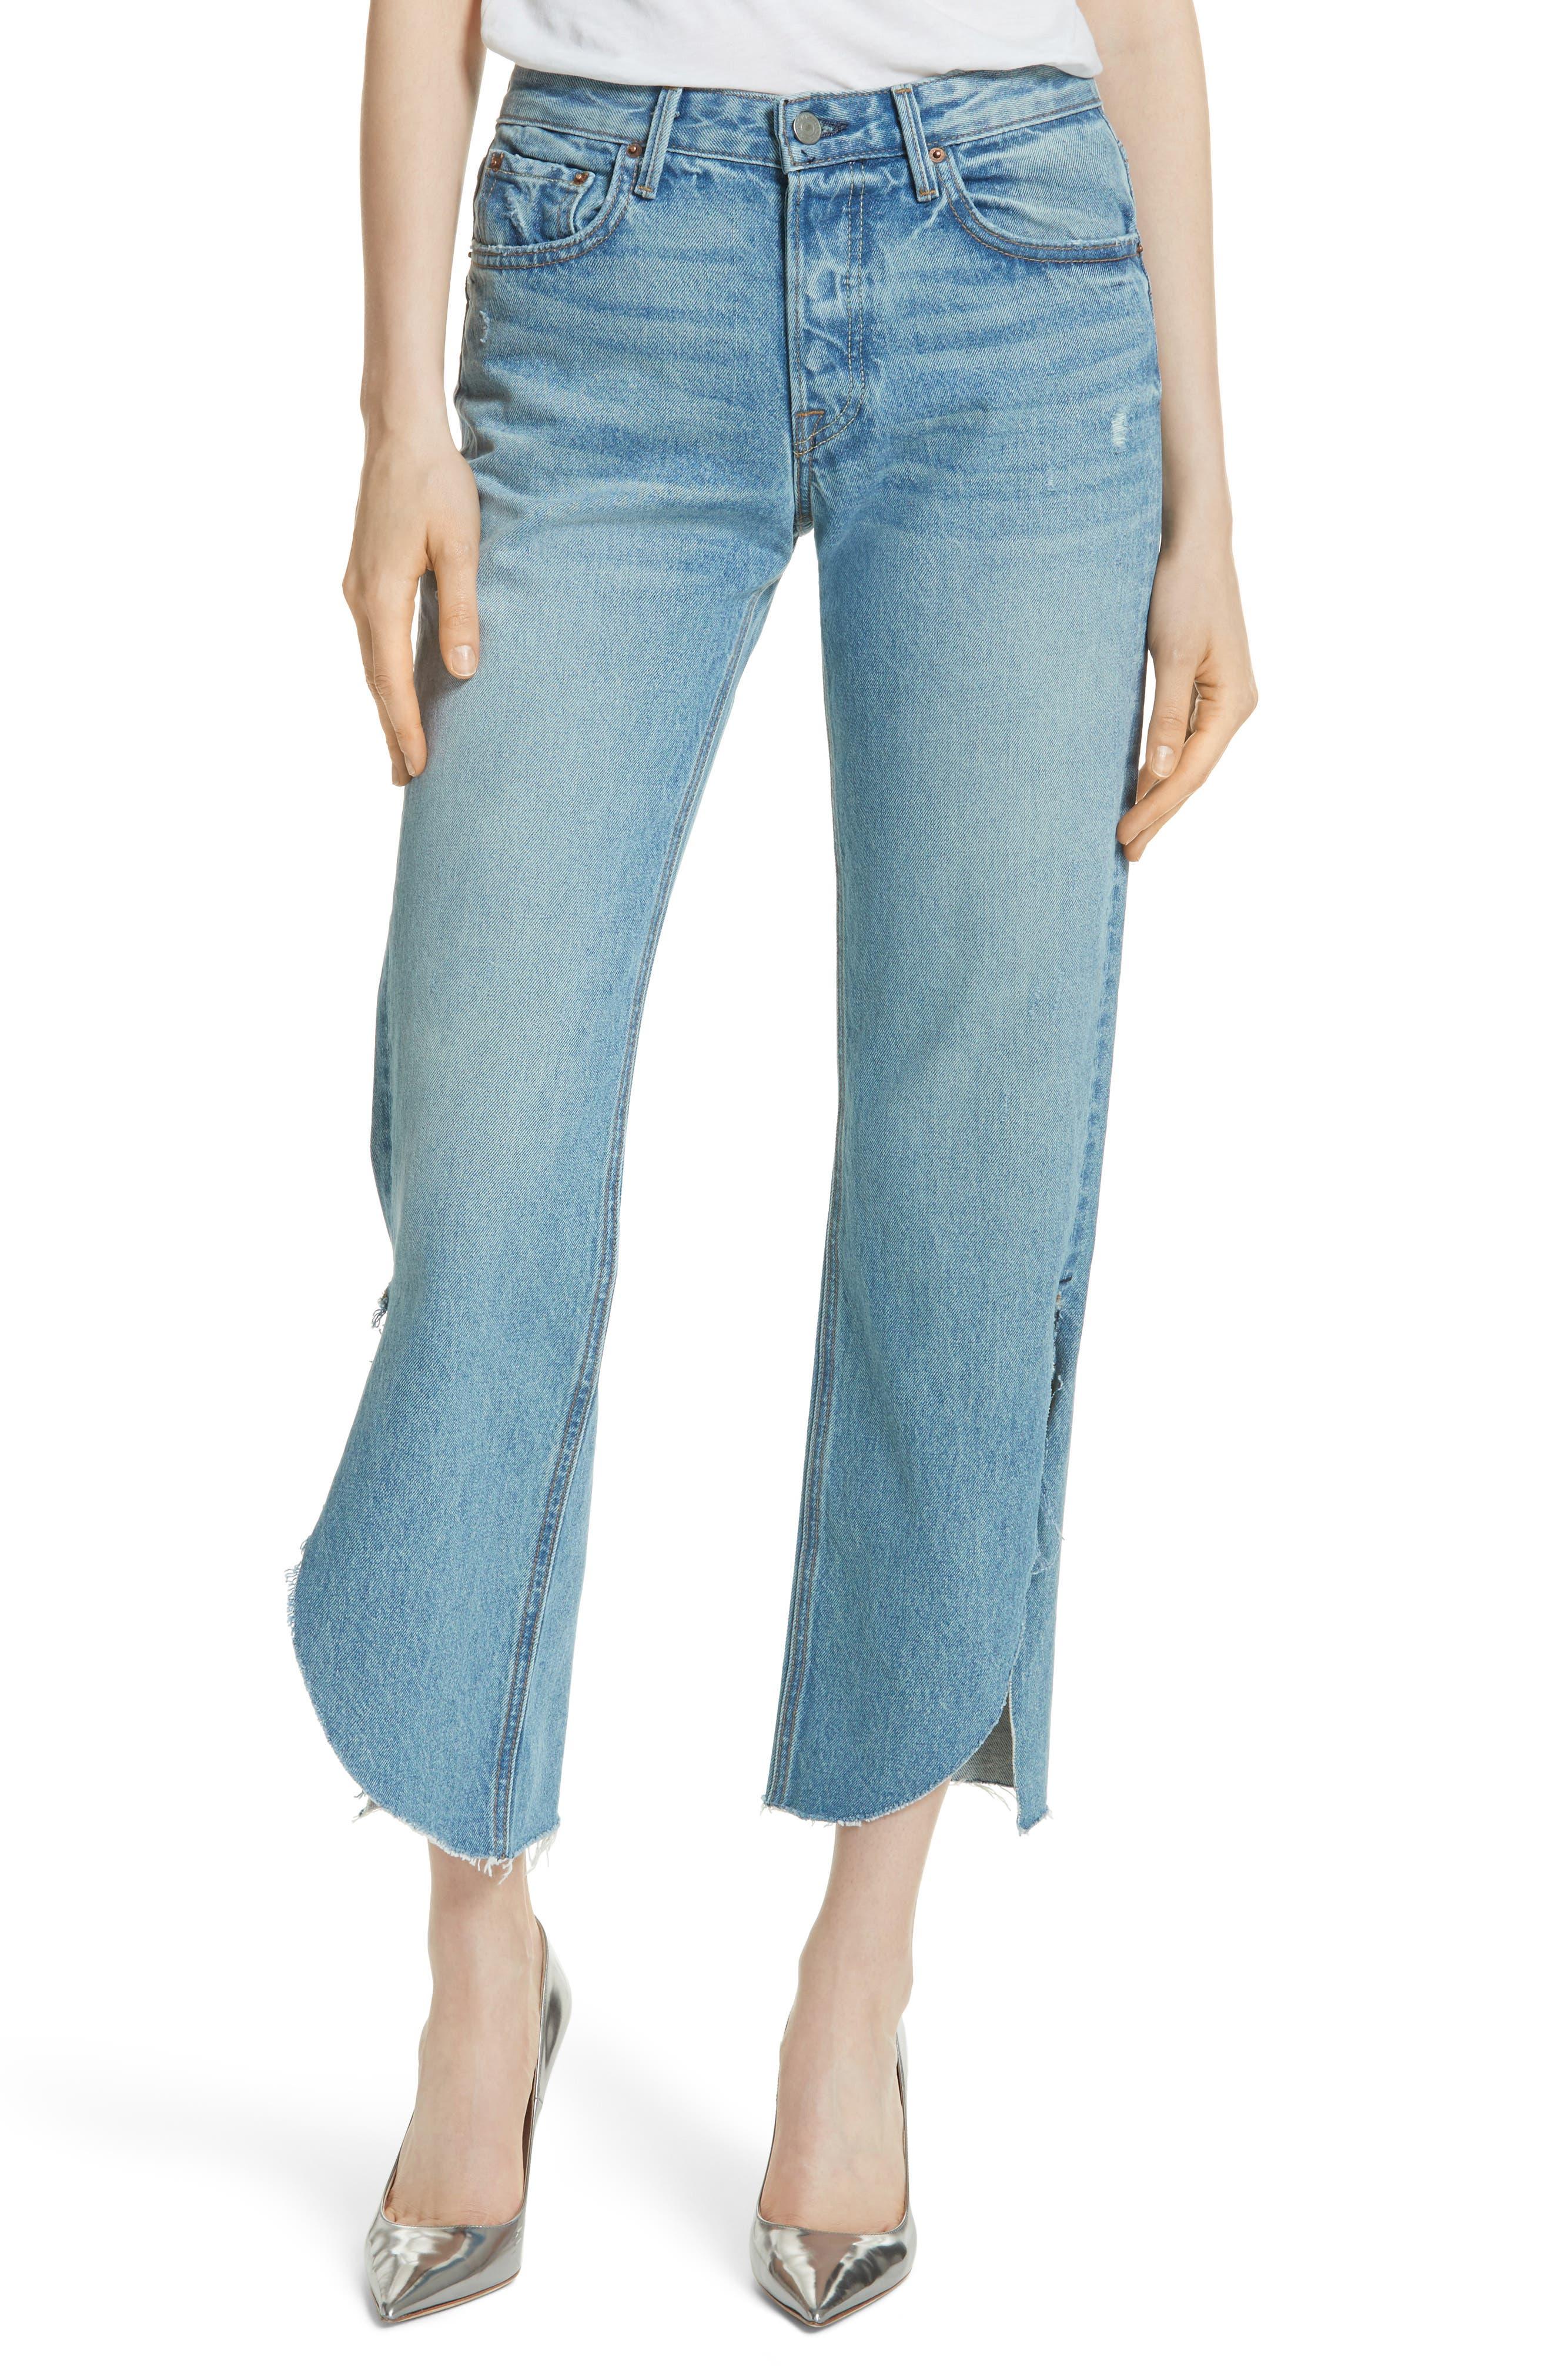 Maran Wide Leg Crop Jeans,                         Main,                         color, Archaic